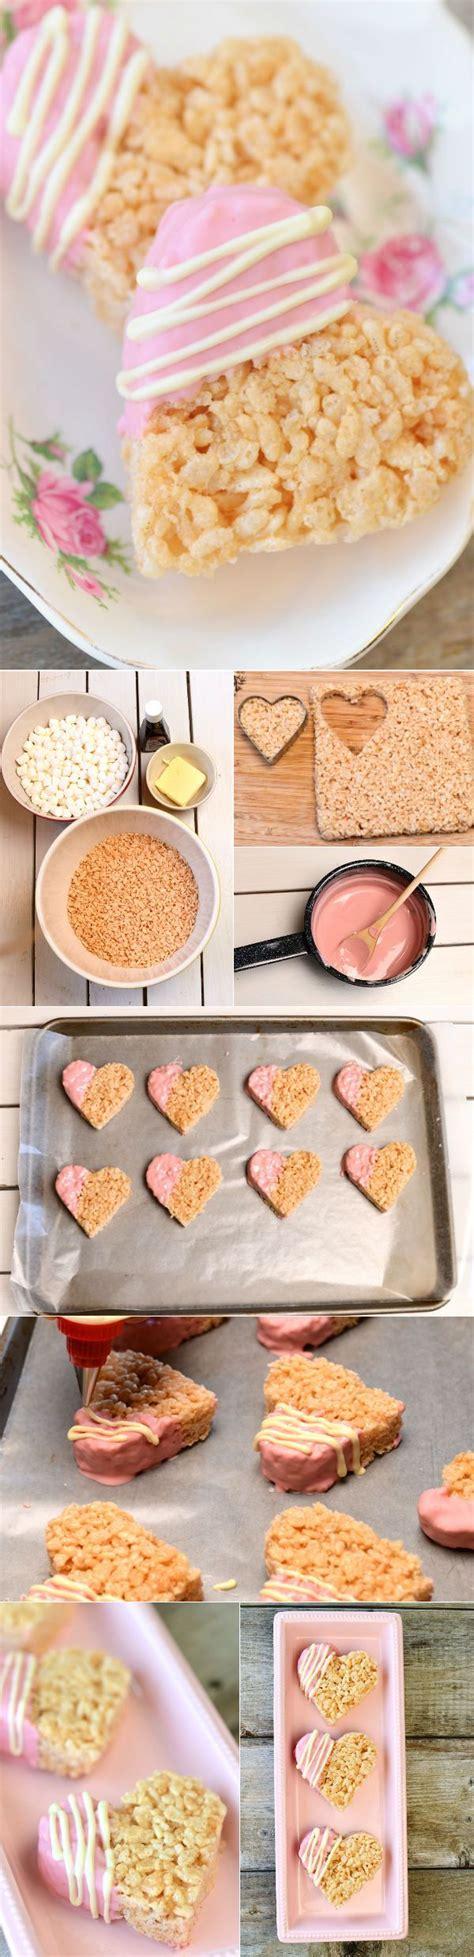 Summer Rice Shower best 25 rice krispies ideas on rice crispy treats rice crispy cake and krispie treats